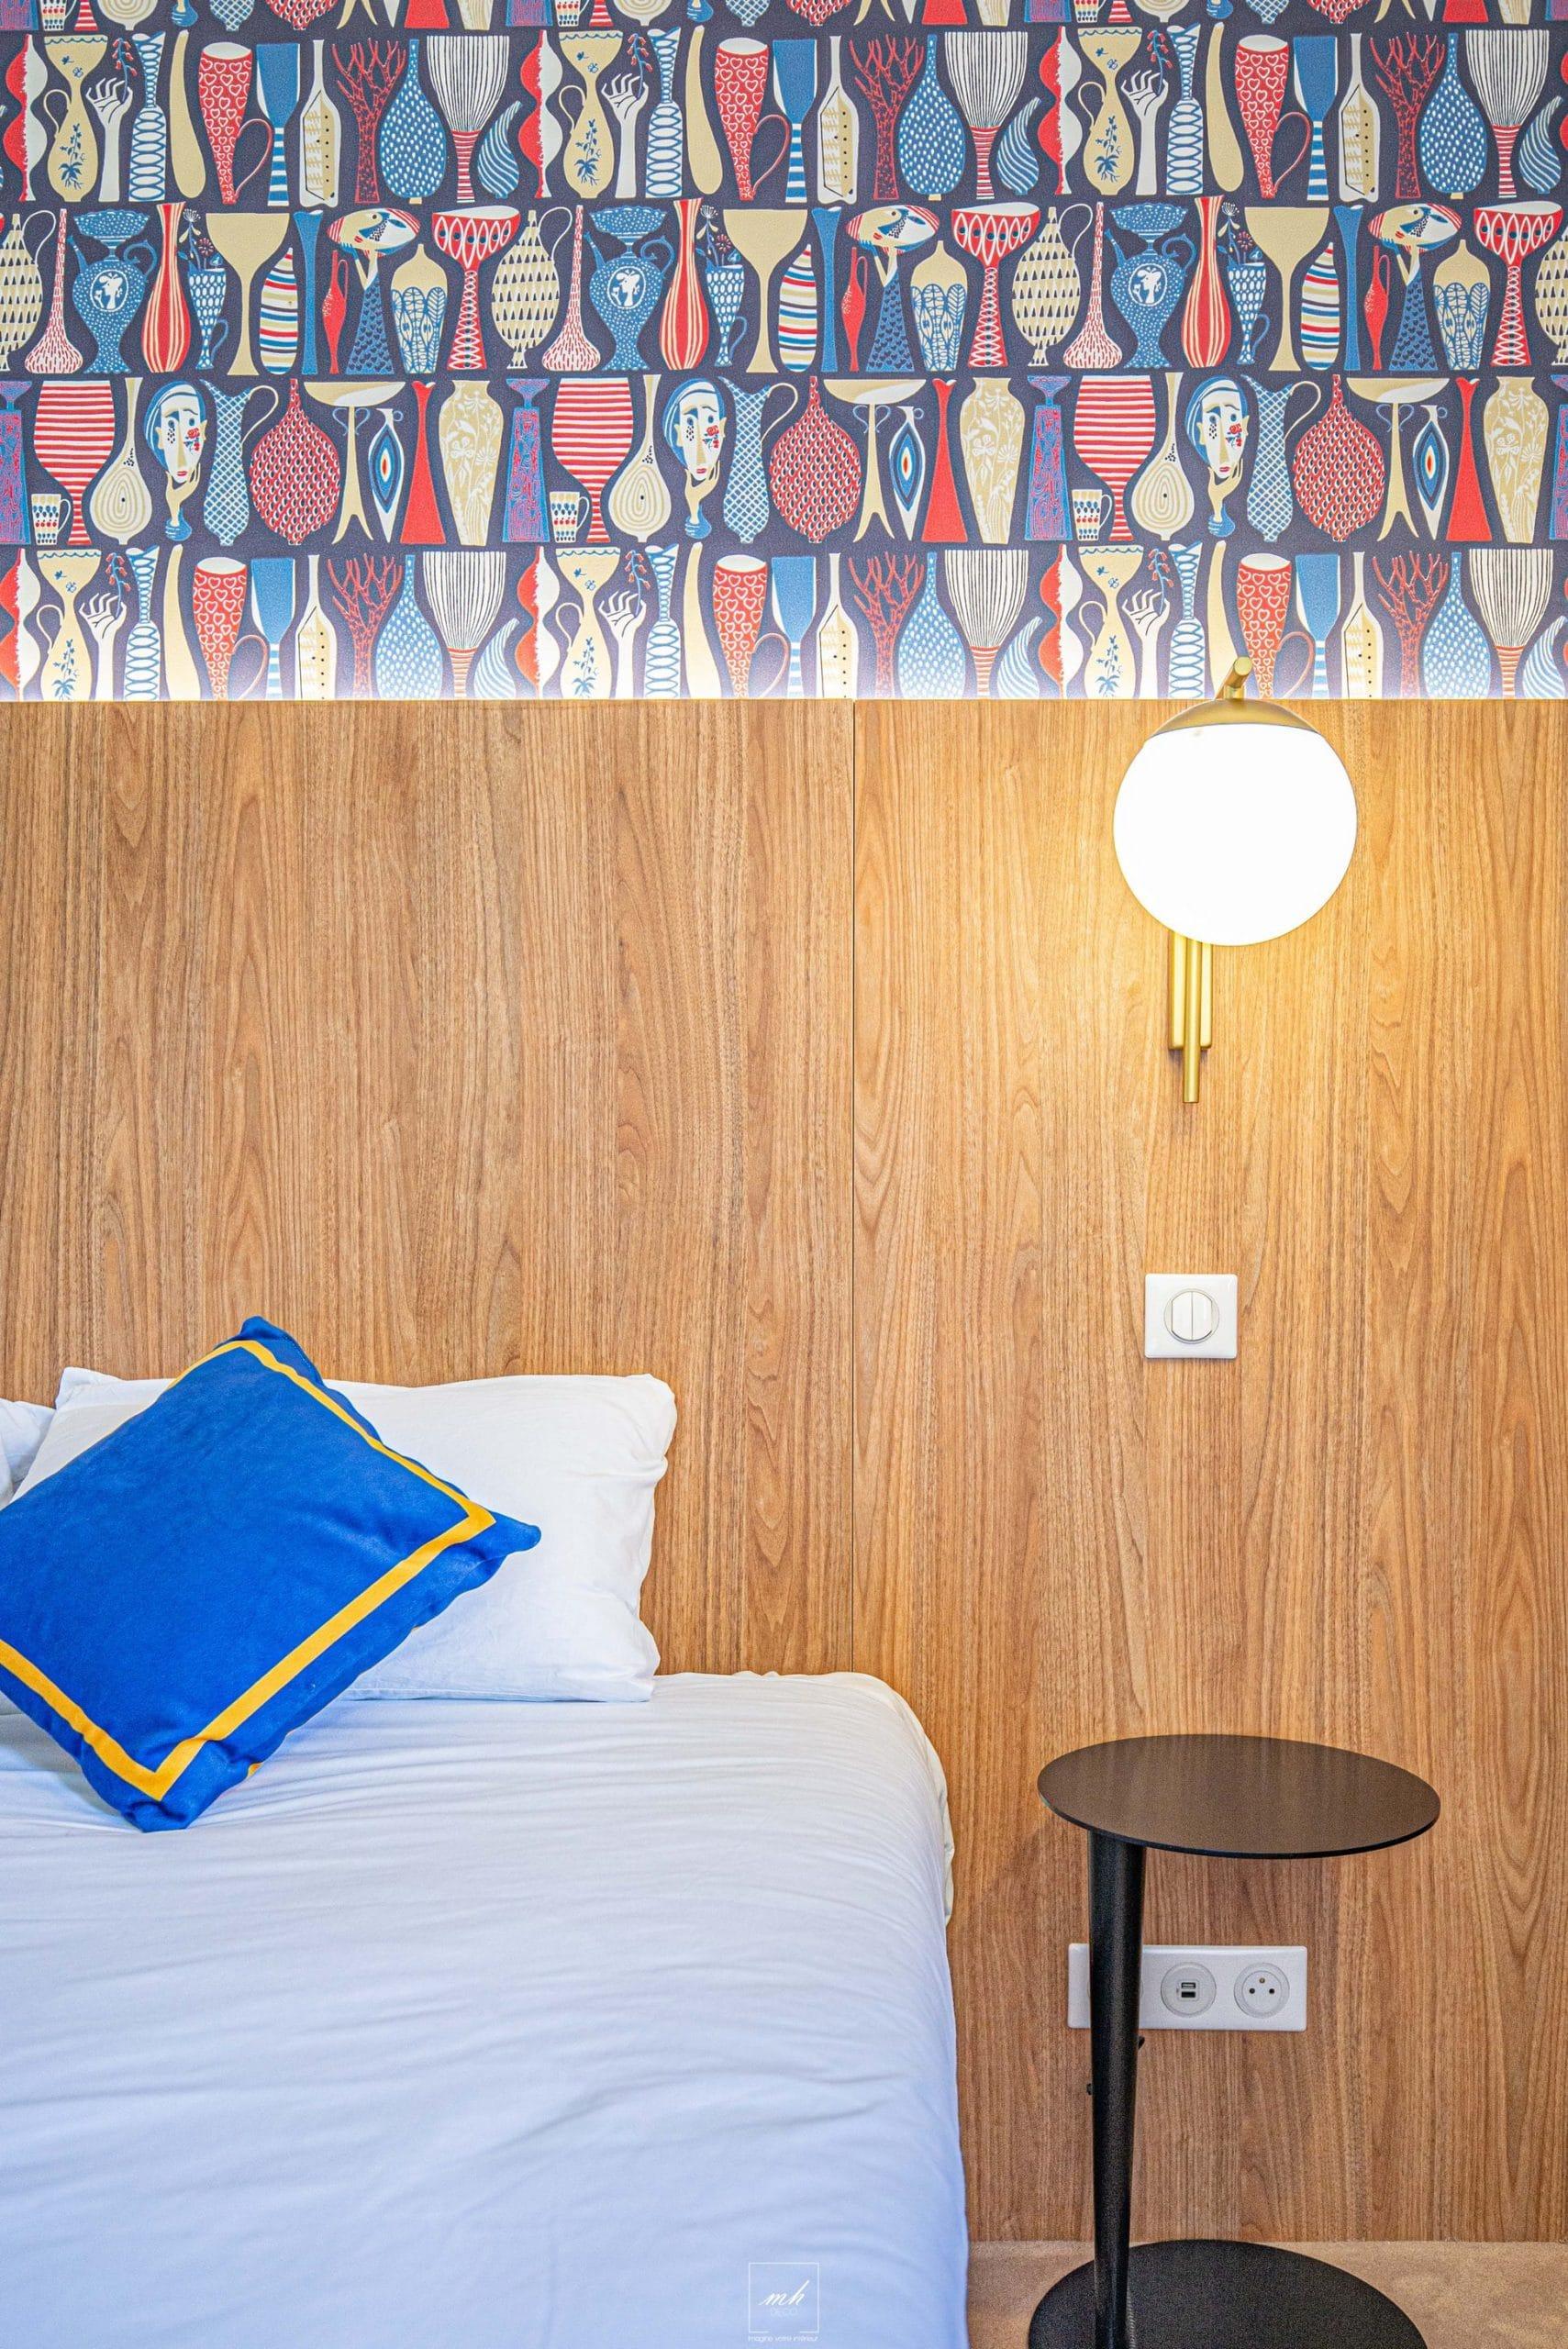 mh-deco-aix-provence-ambiance-hotel-chambre